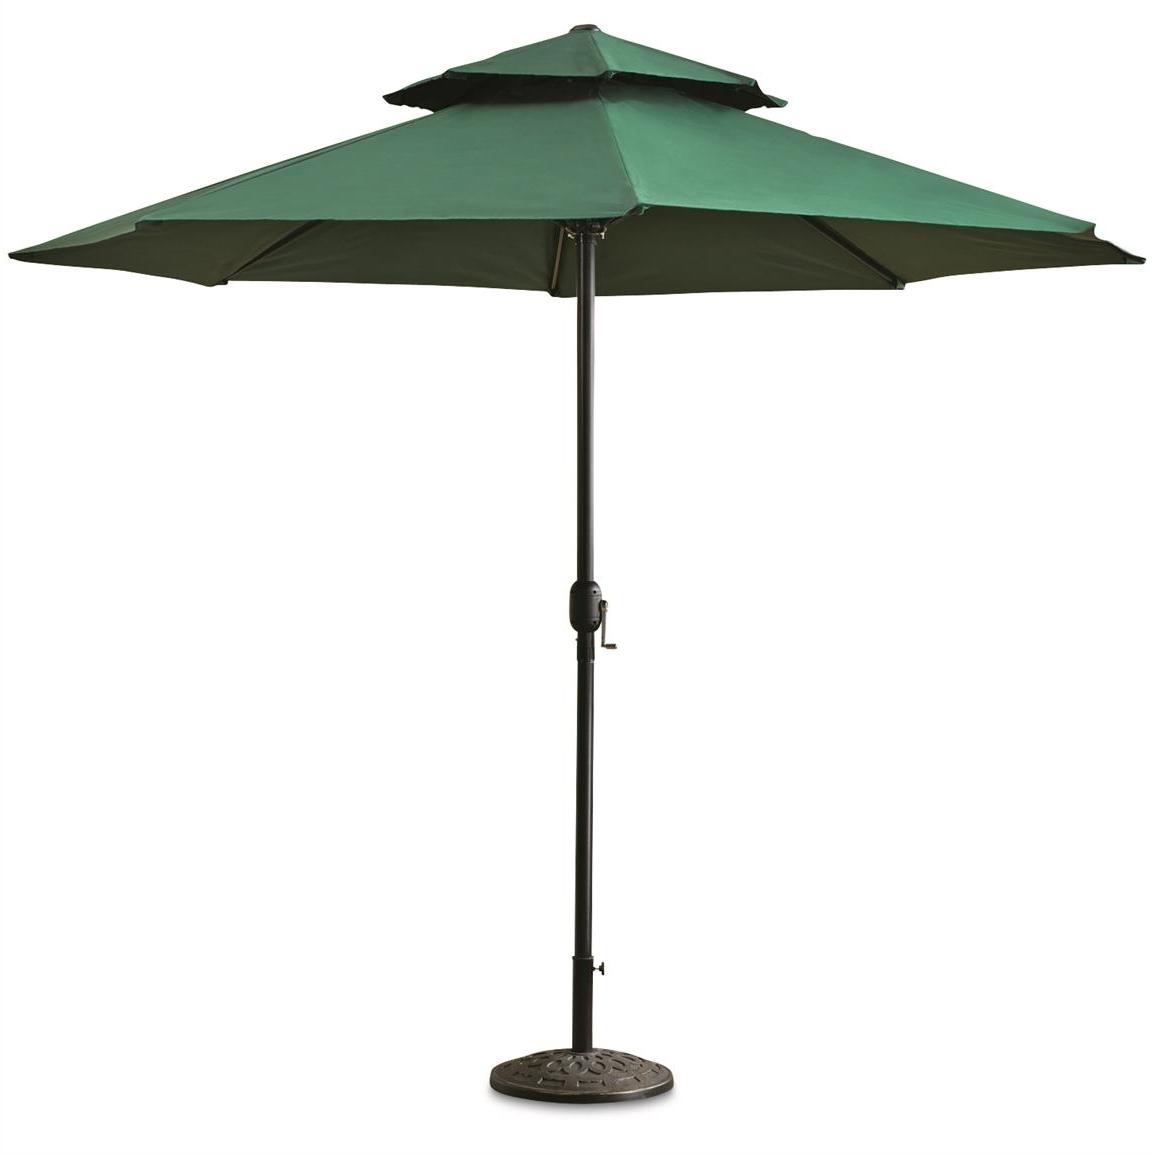 Most Popular Castlecreek 10' Double Layer Patio Umbrella – 678520, Patio Throughout Green Patio Umbrellas (View 4 of 20)